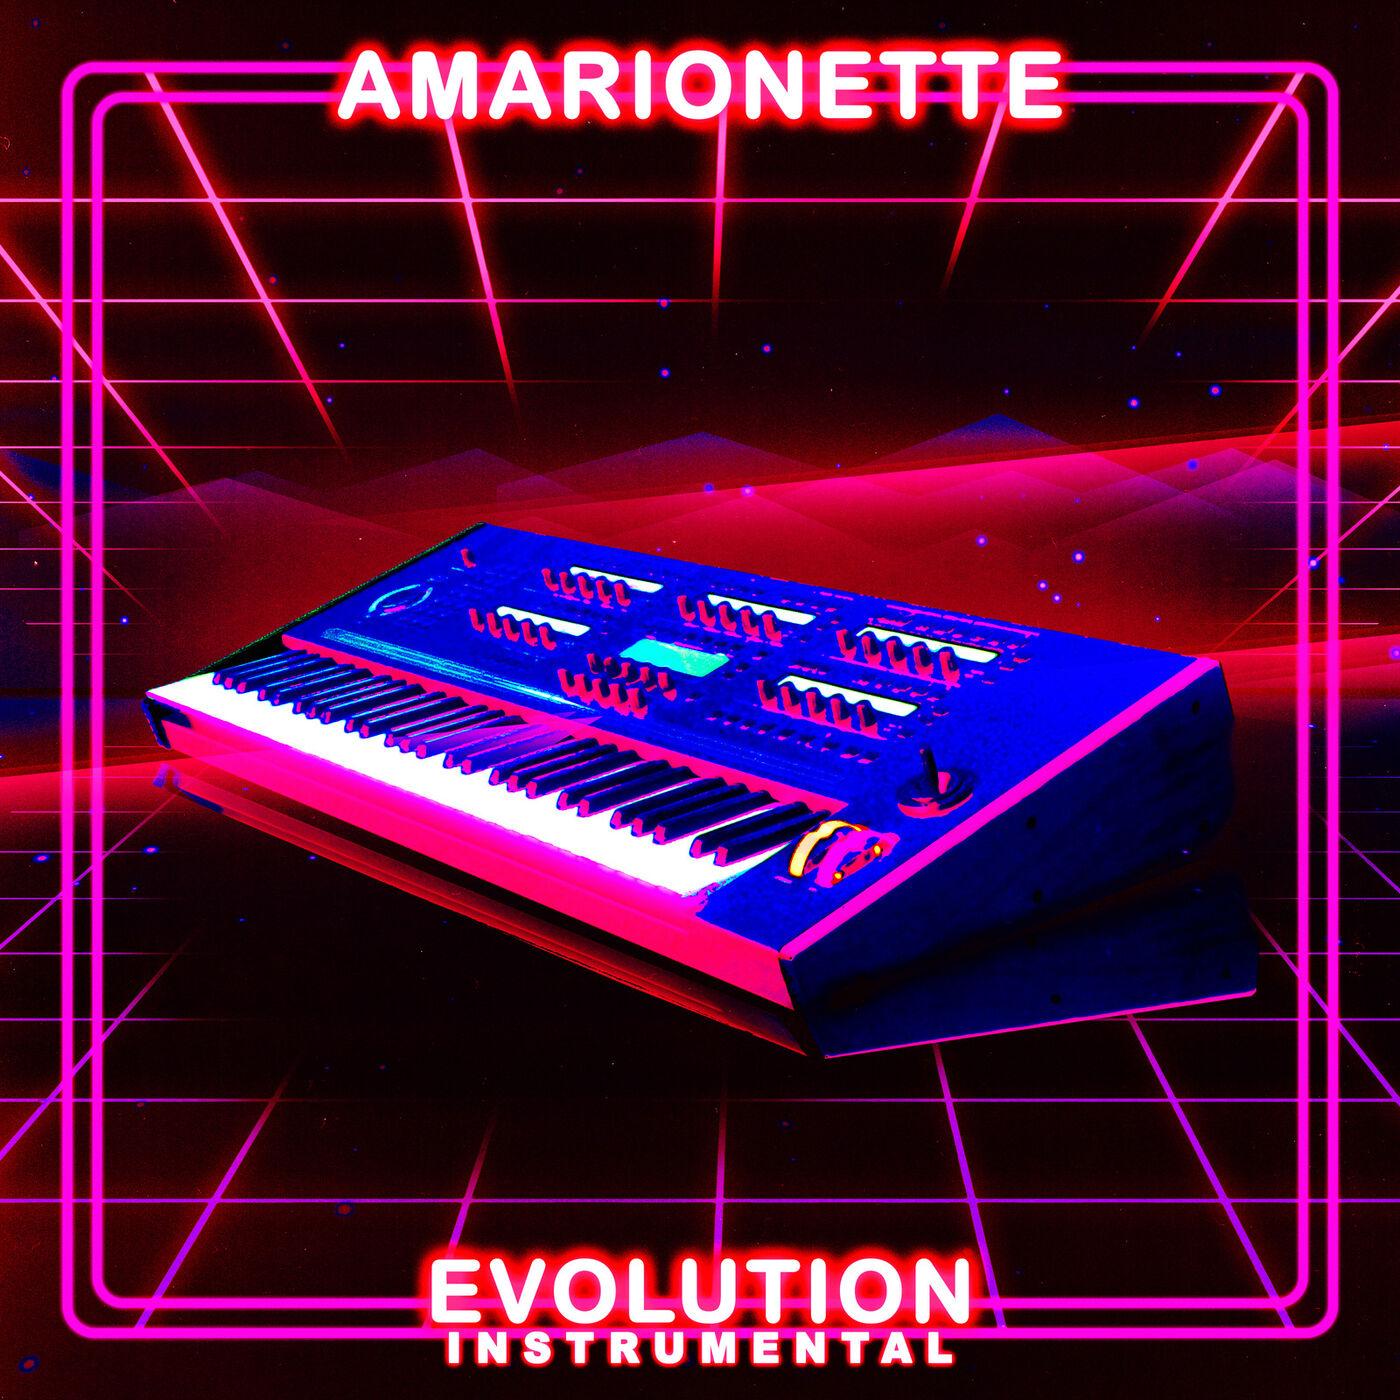 Amarionette - Evolution (Instrumental) [EP] (2020)